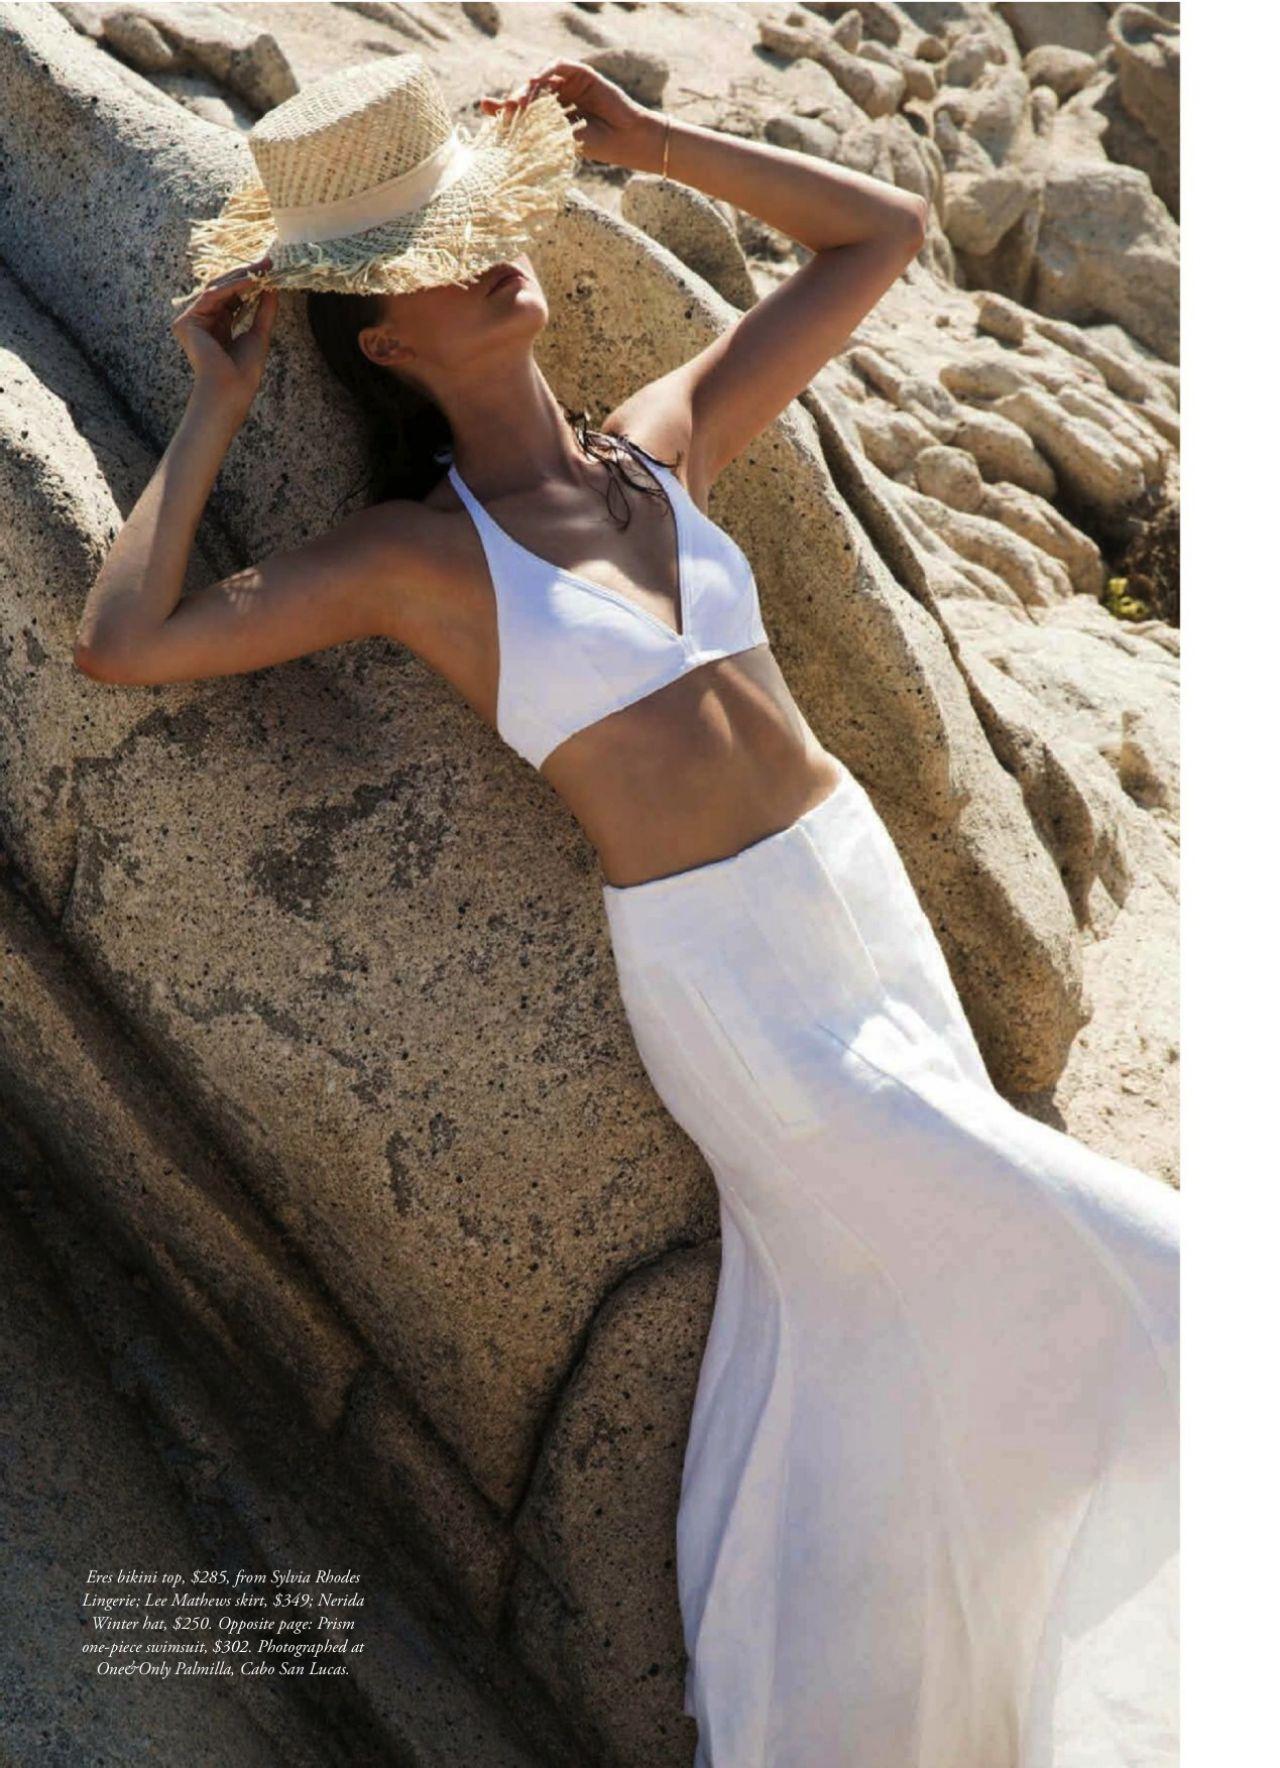 Diana Moldovan Harper S Bazaar Magazine Australia